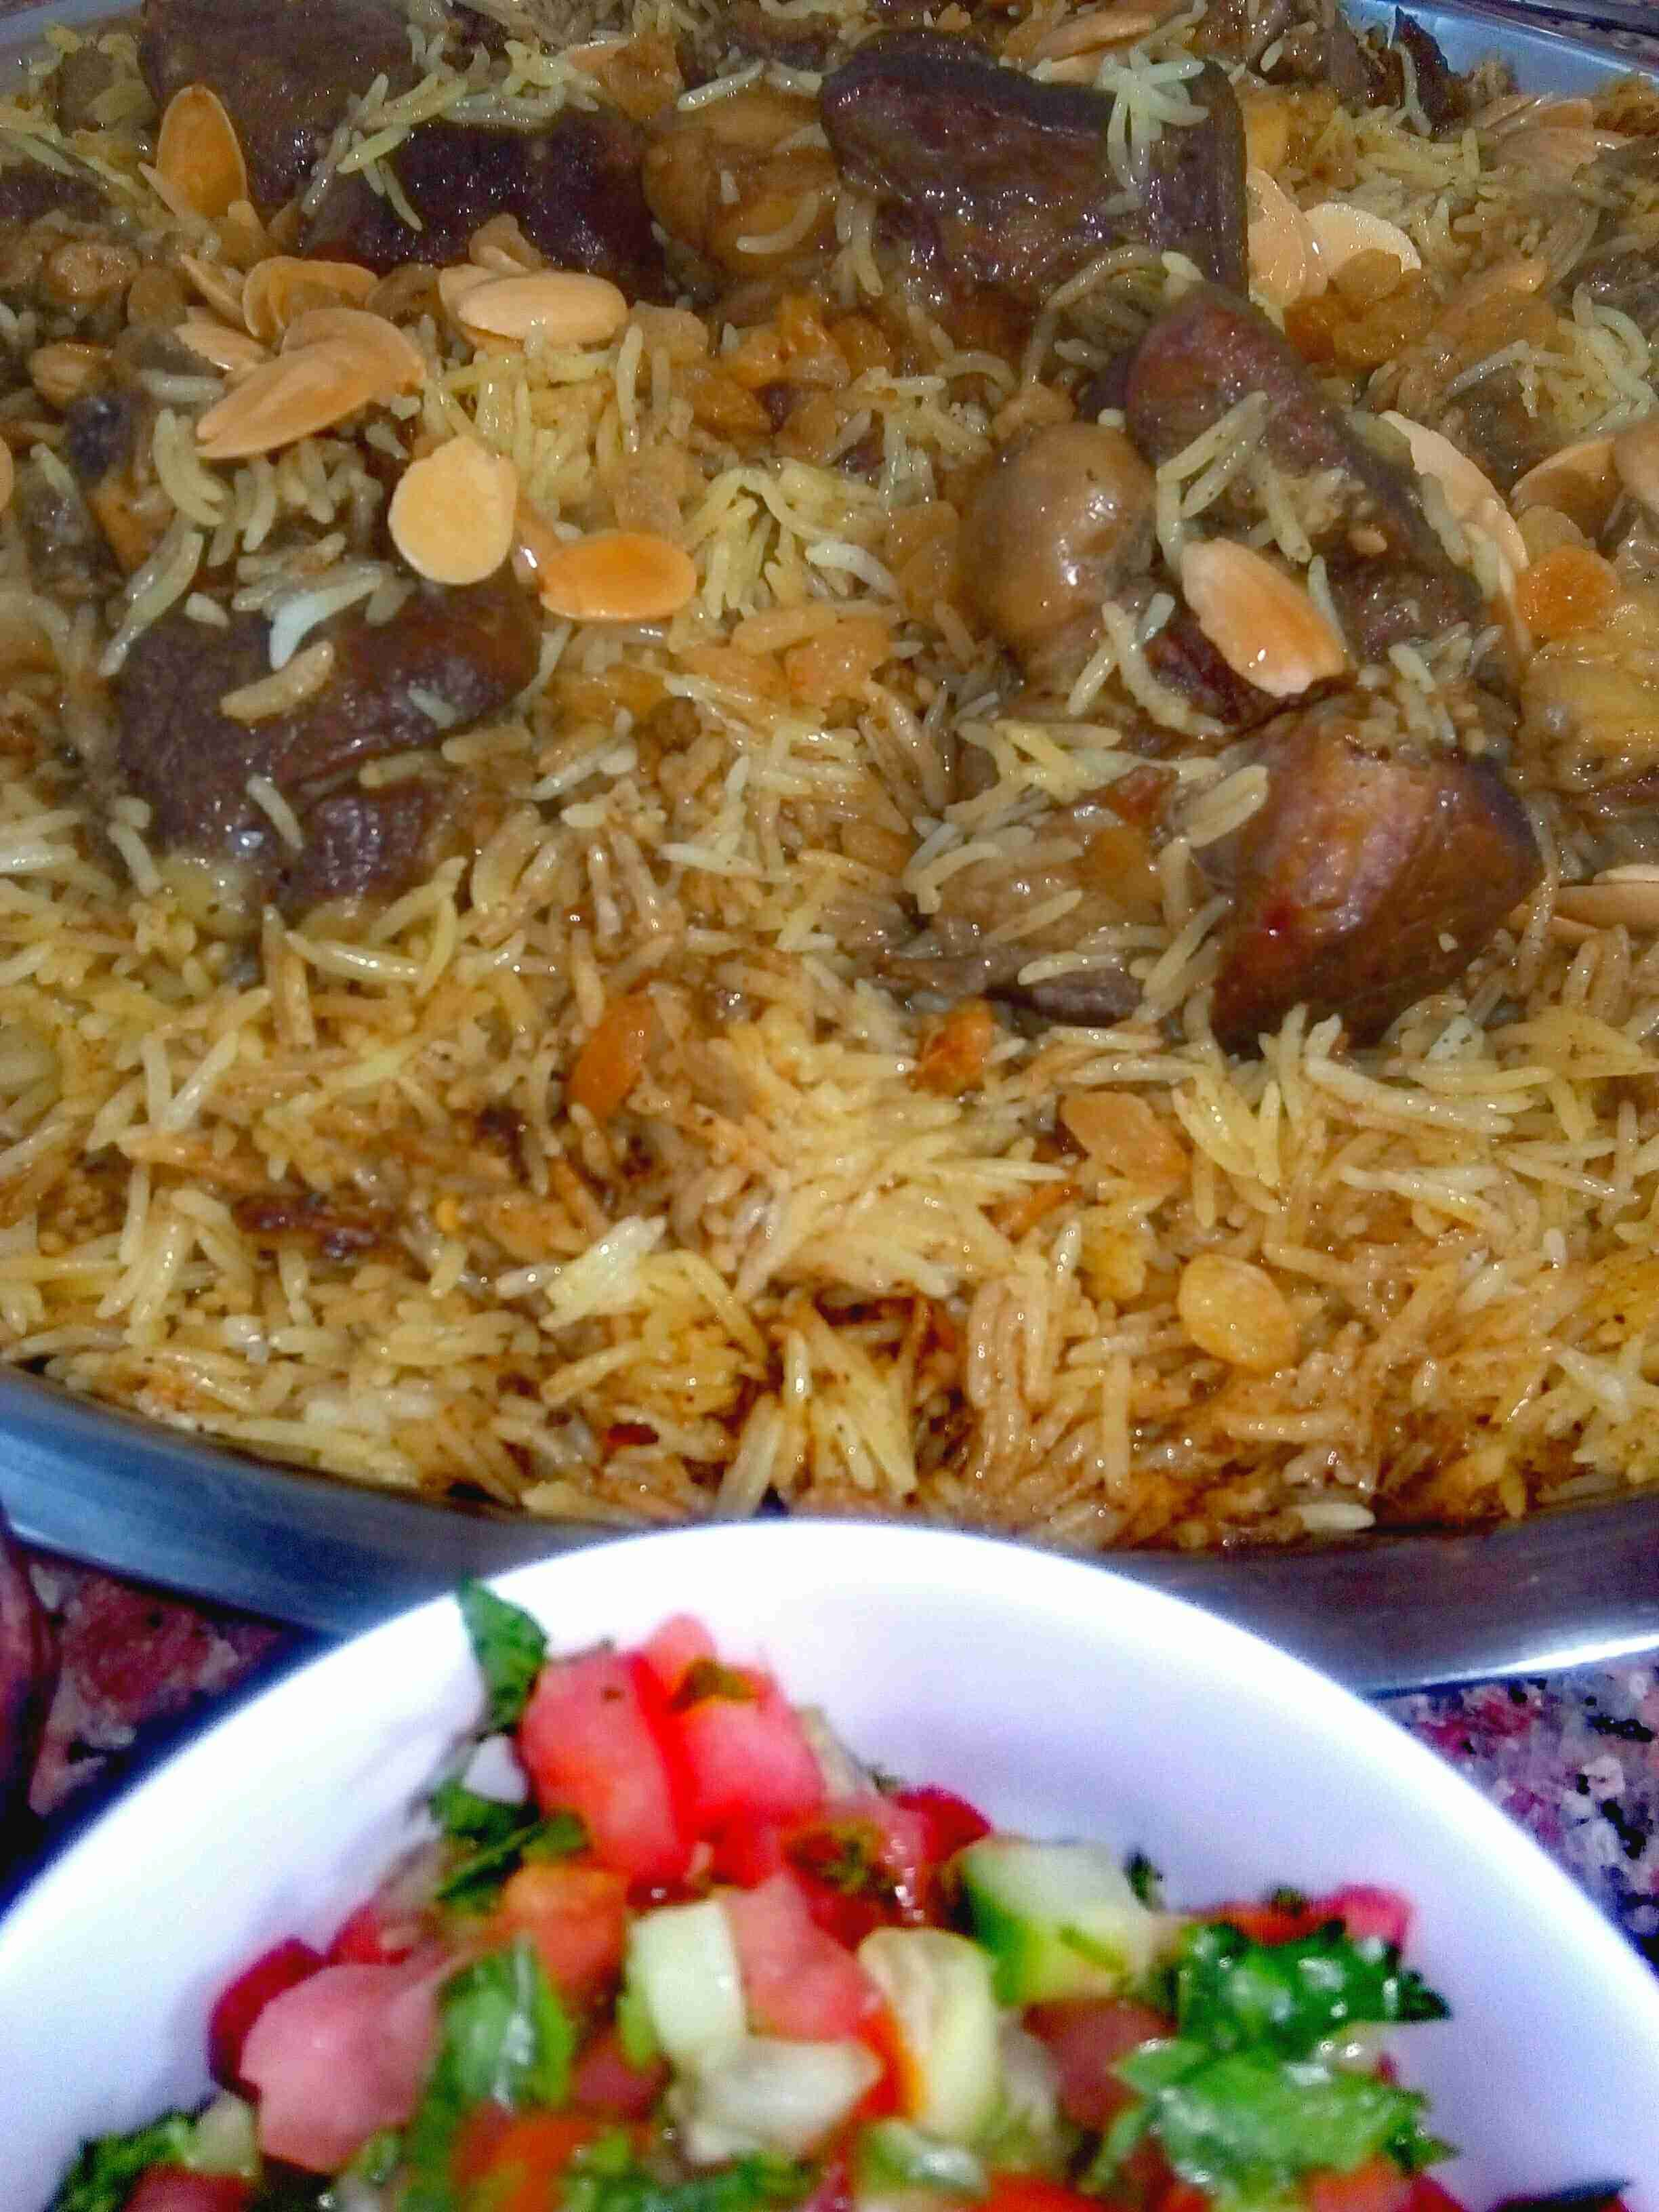 مضغوط اللحم ولا اروع زاكي Food Dishes Indian Rice Recipes Mediterranean Recipes